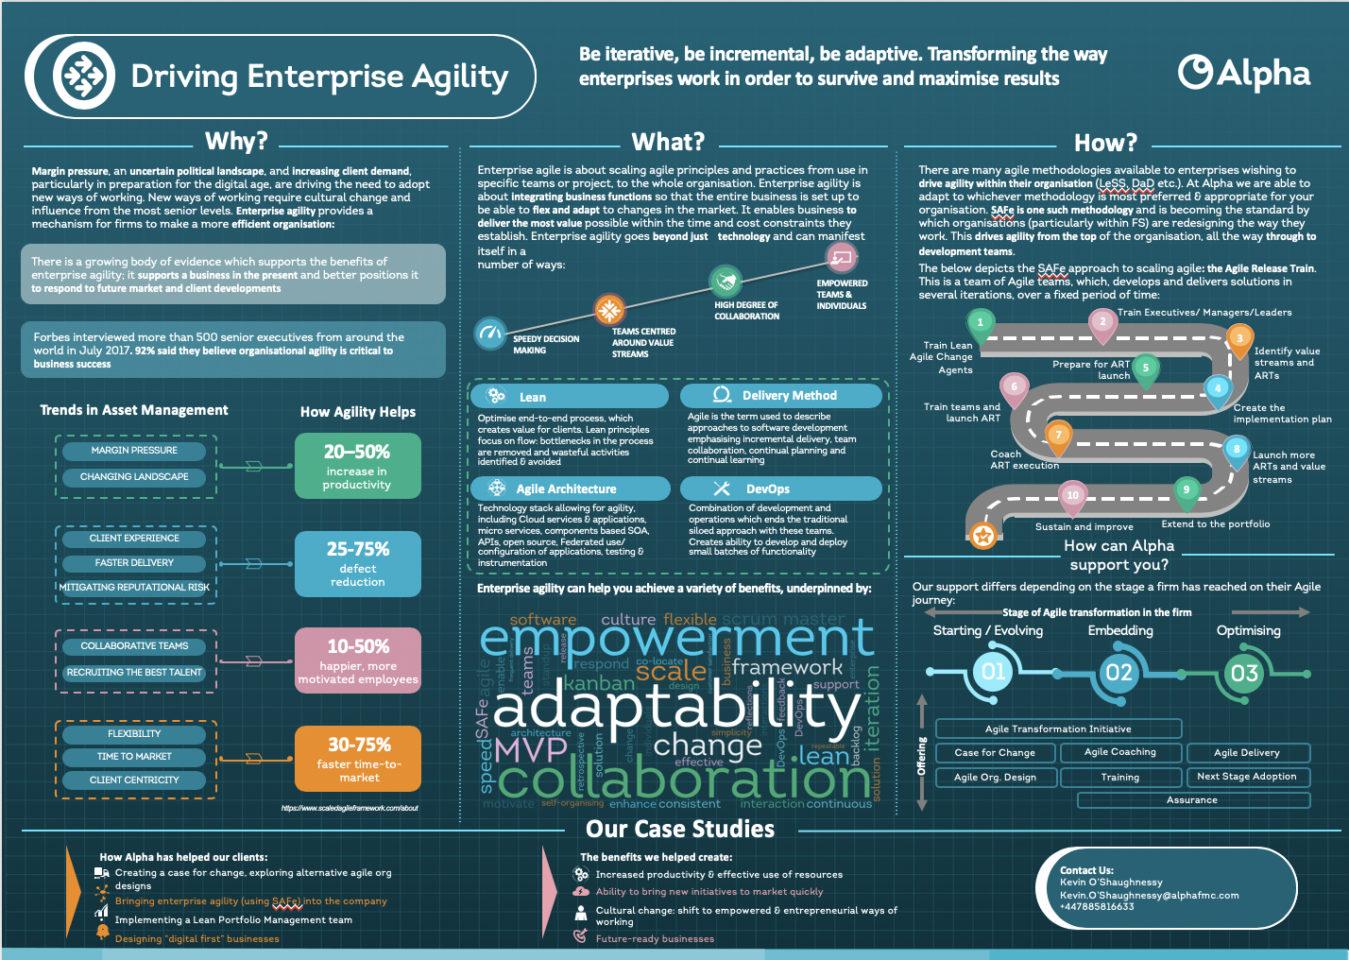 Agile transformation - driving enterprise agility